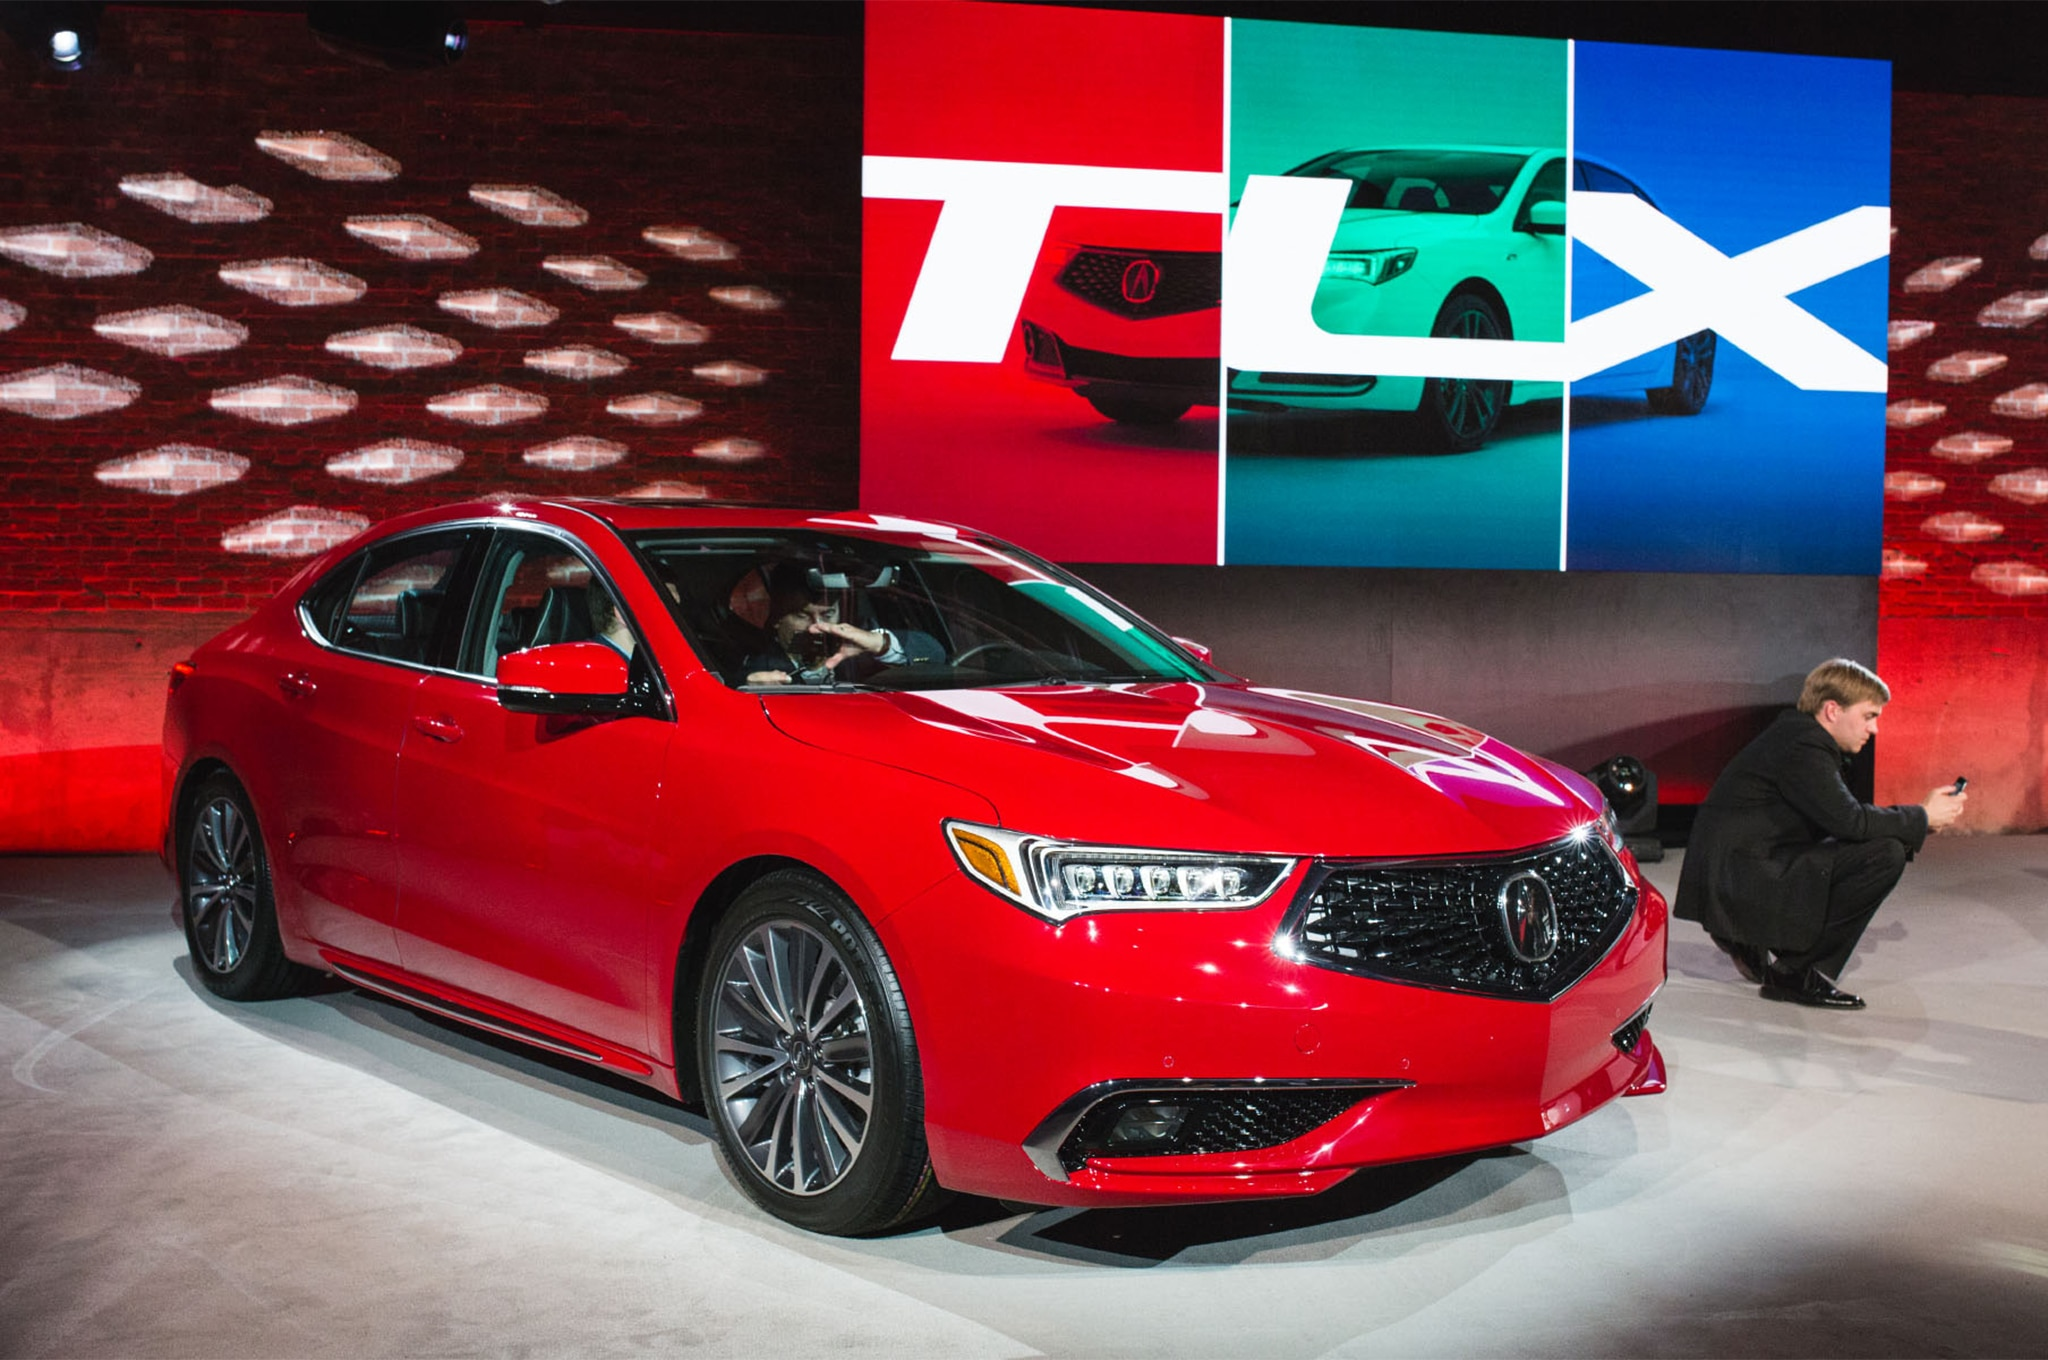 2018 Acura TLX Front Three Quarter 01